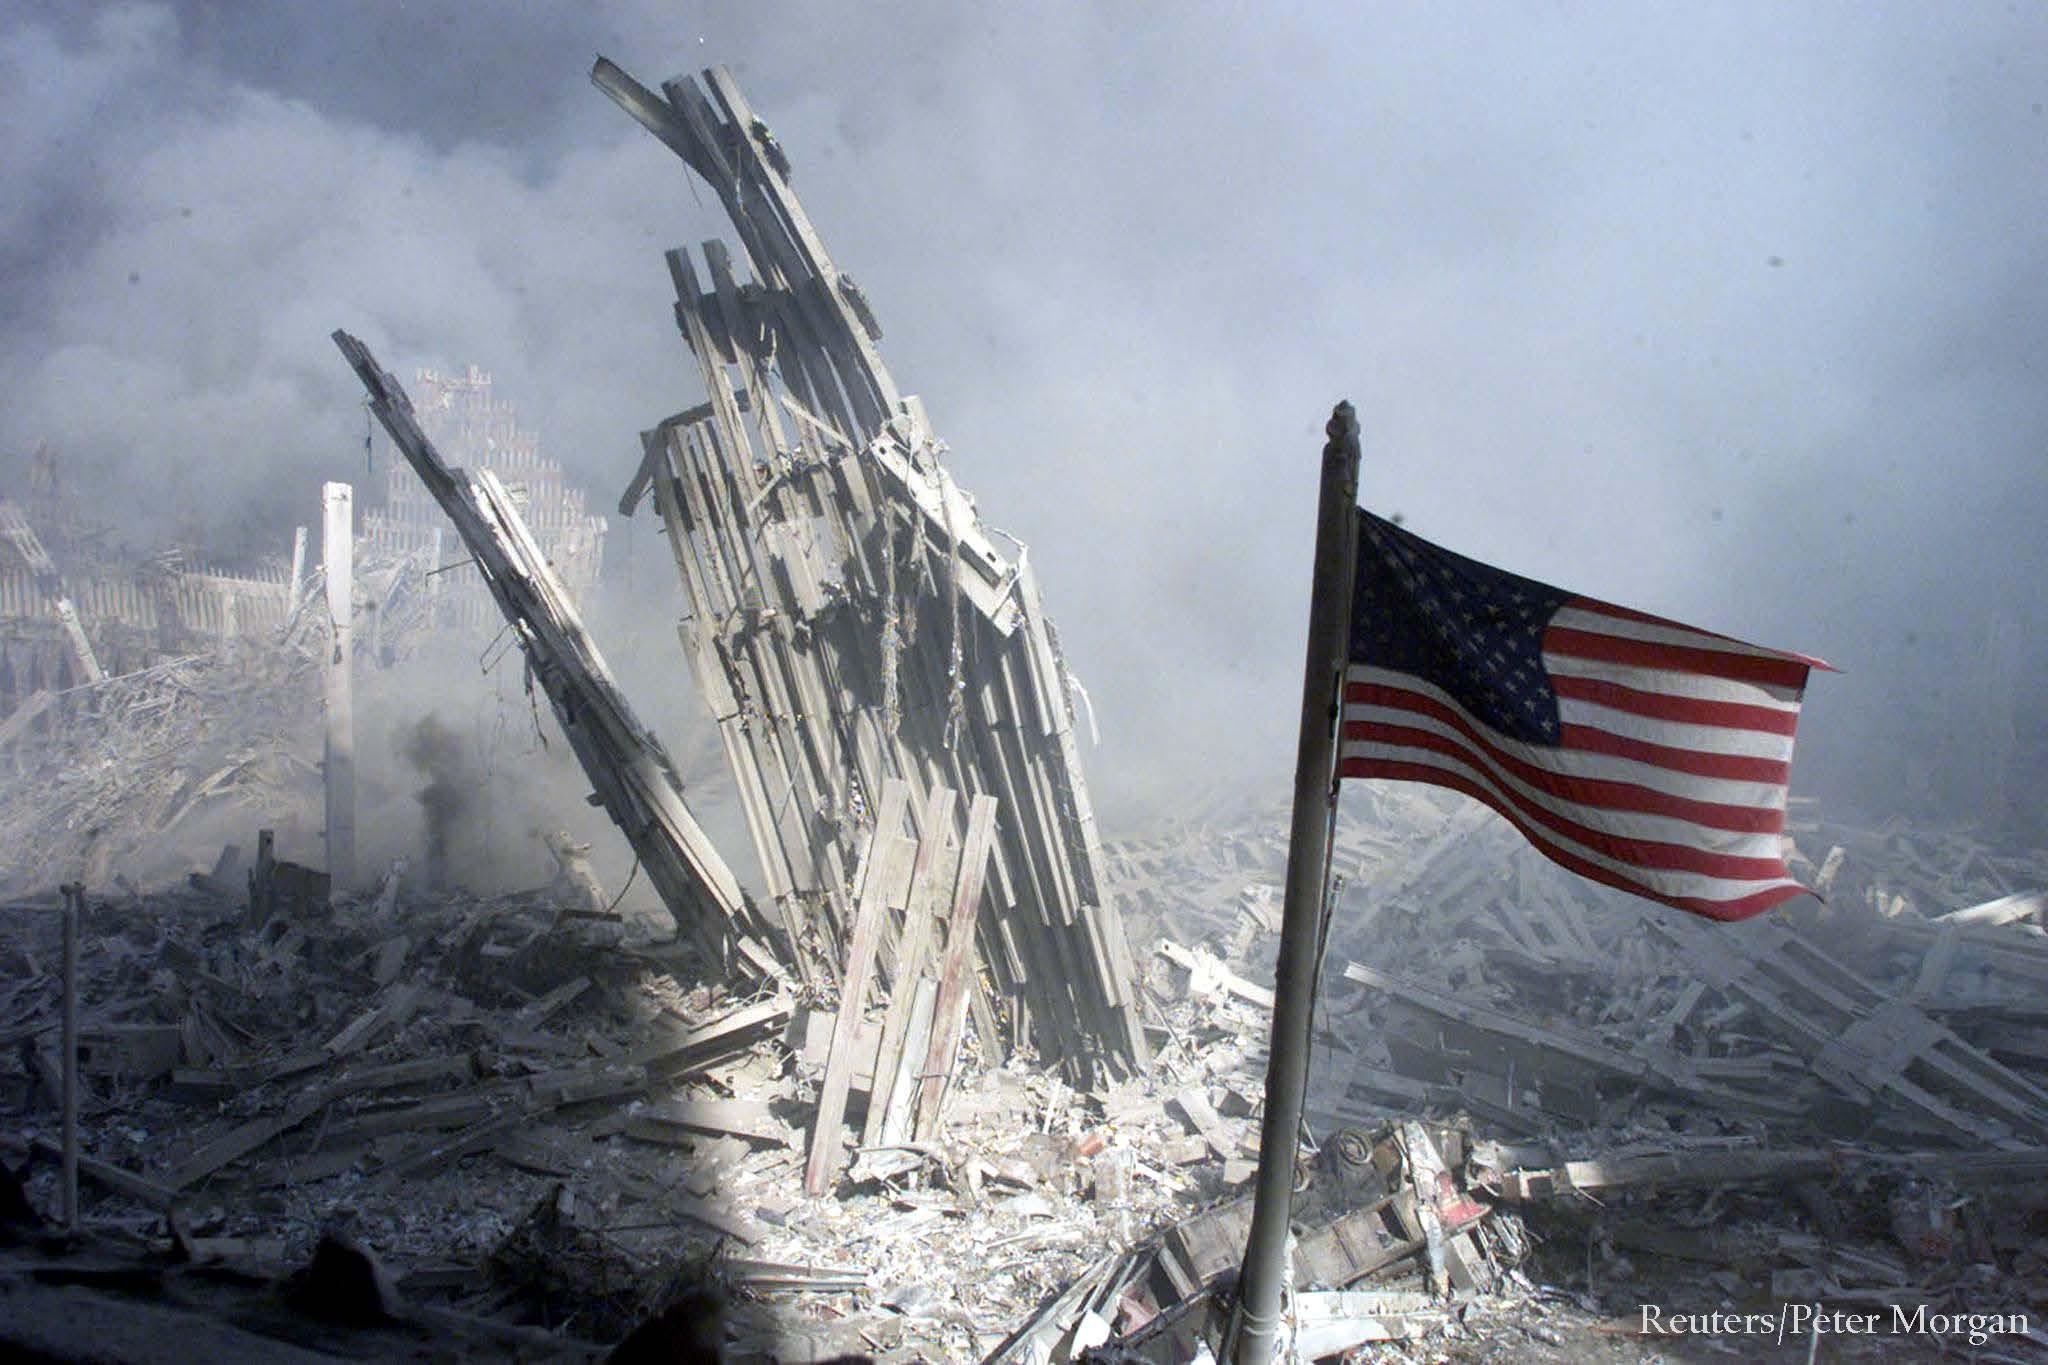 Simulation: Responding to 9/11